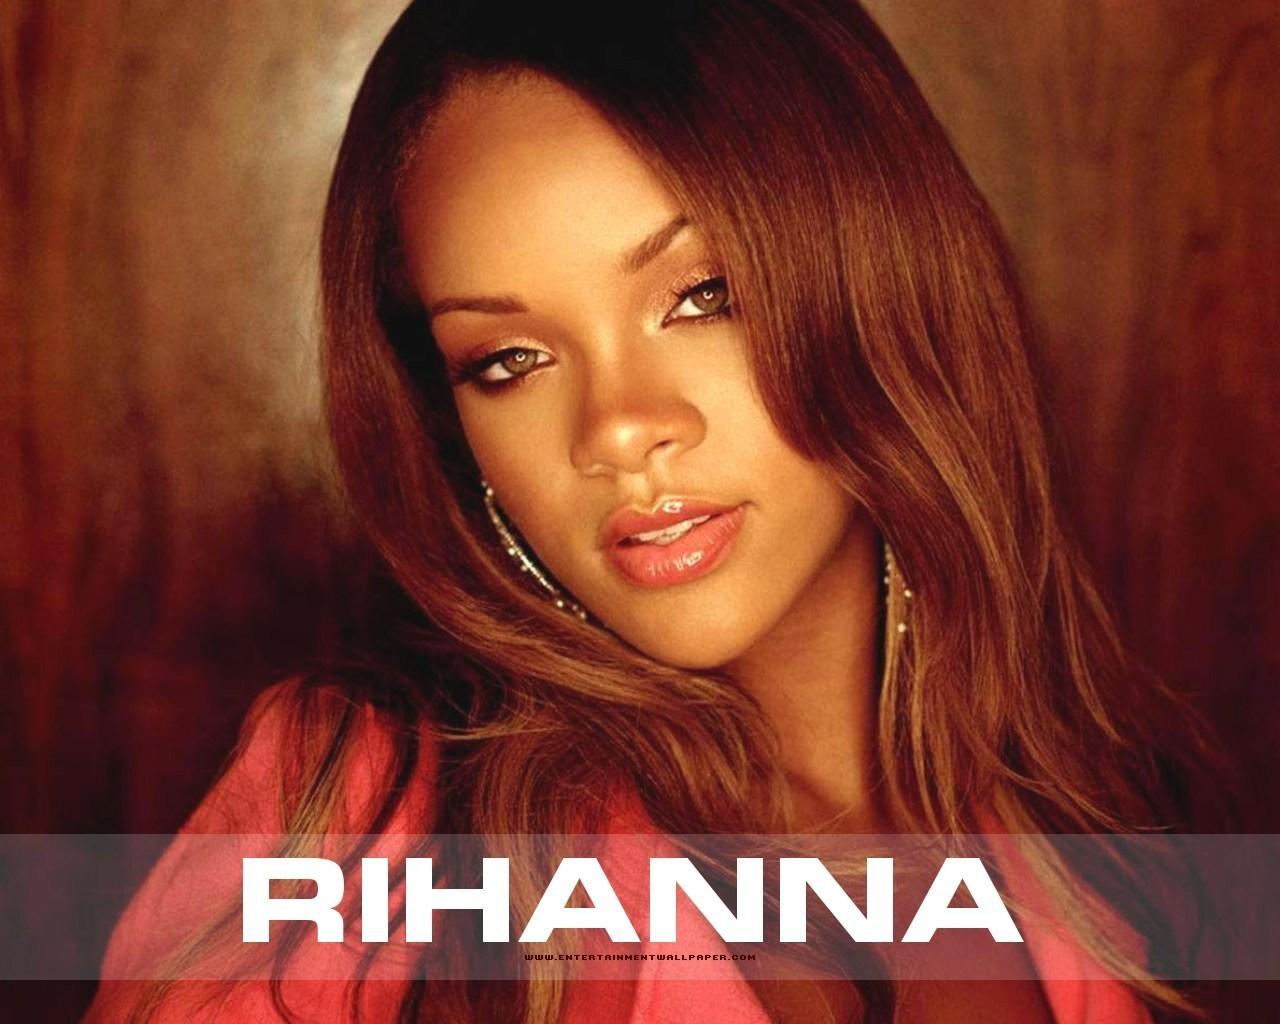 Rihanna♥ - Rihanna Wallpaper (6465328) - Fanpop Rihanna